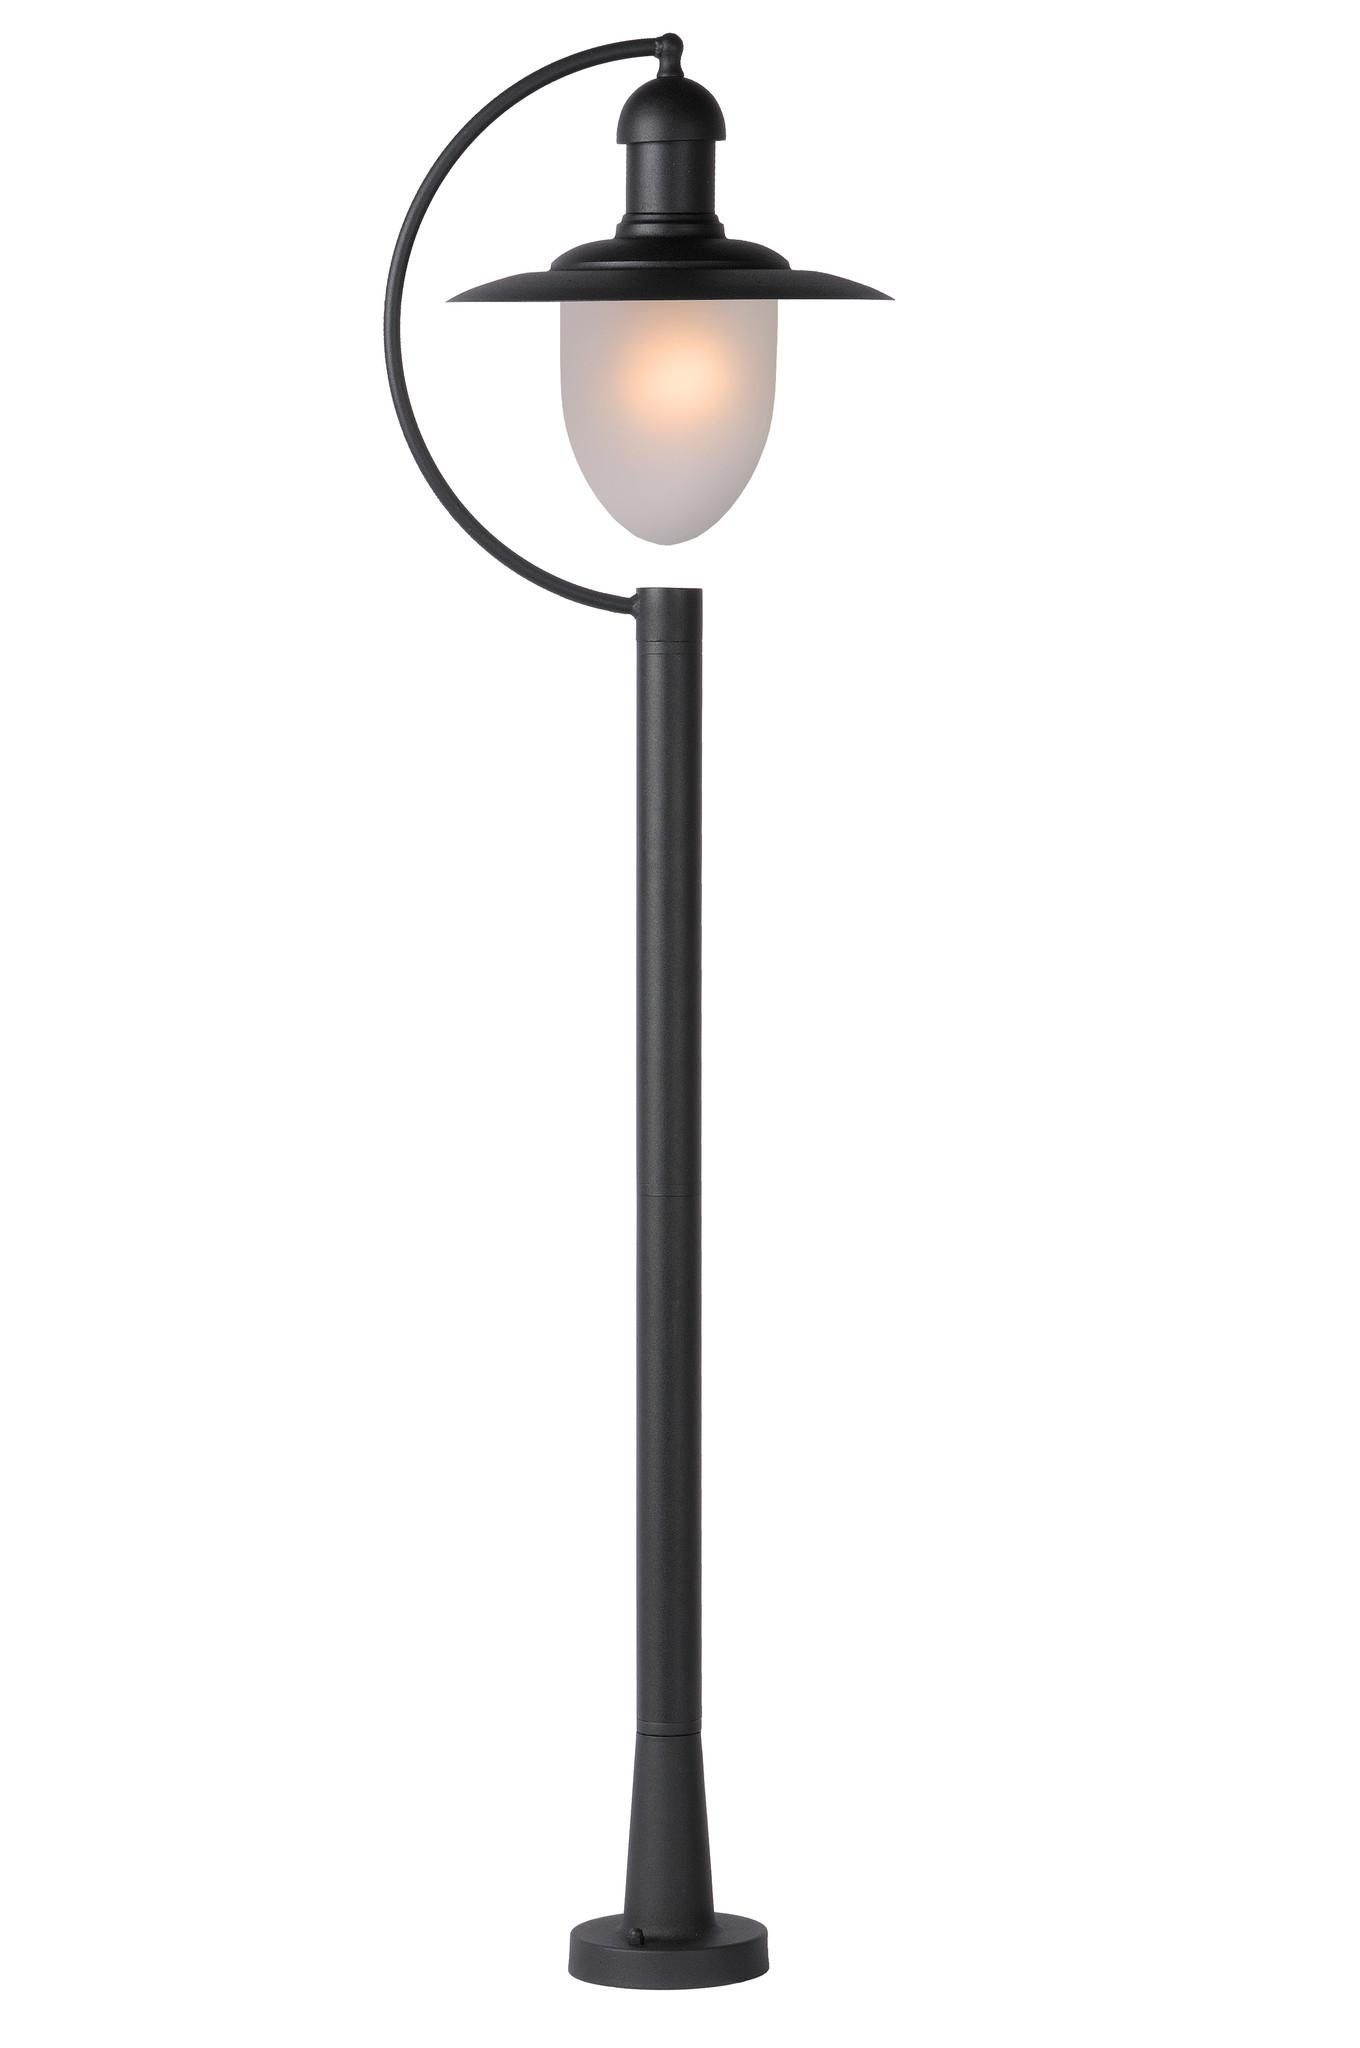 ARUBA Lantaarnpaal Buiten-Zwart-1xE27-24W-IP44